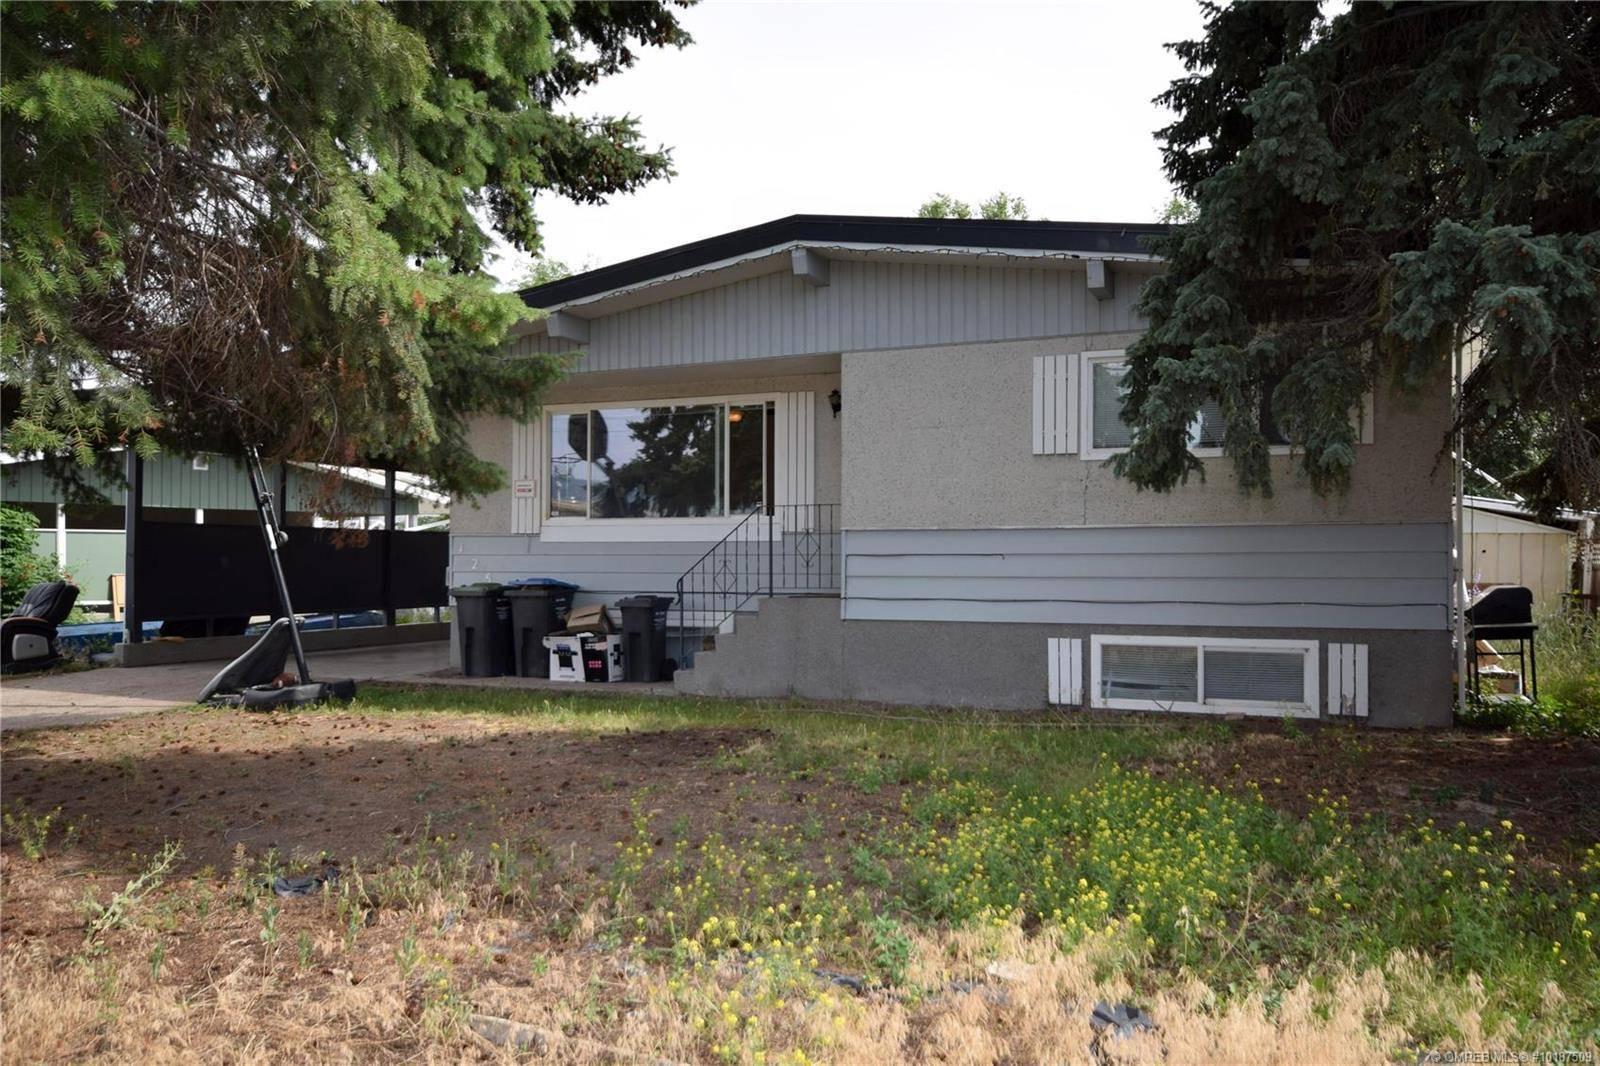 House for sale at 125 Dillman Rd Kelowna British Columbia - MLS: 10187509